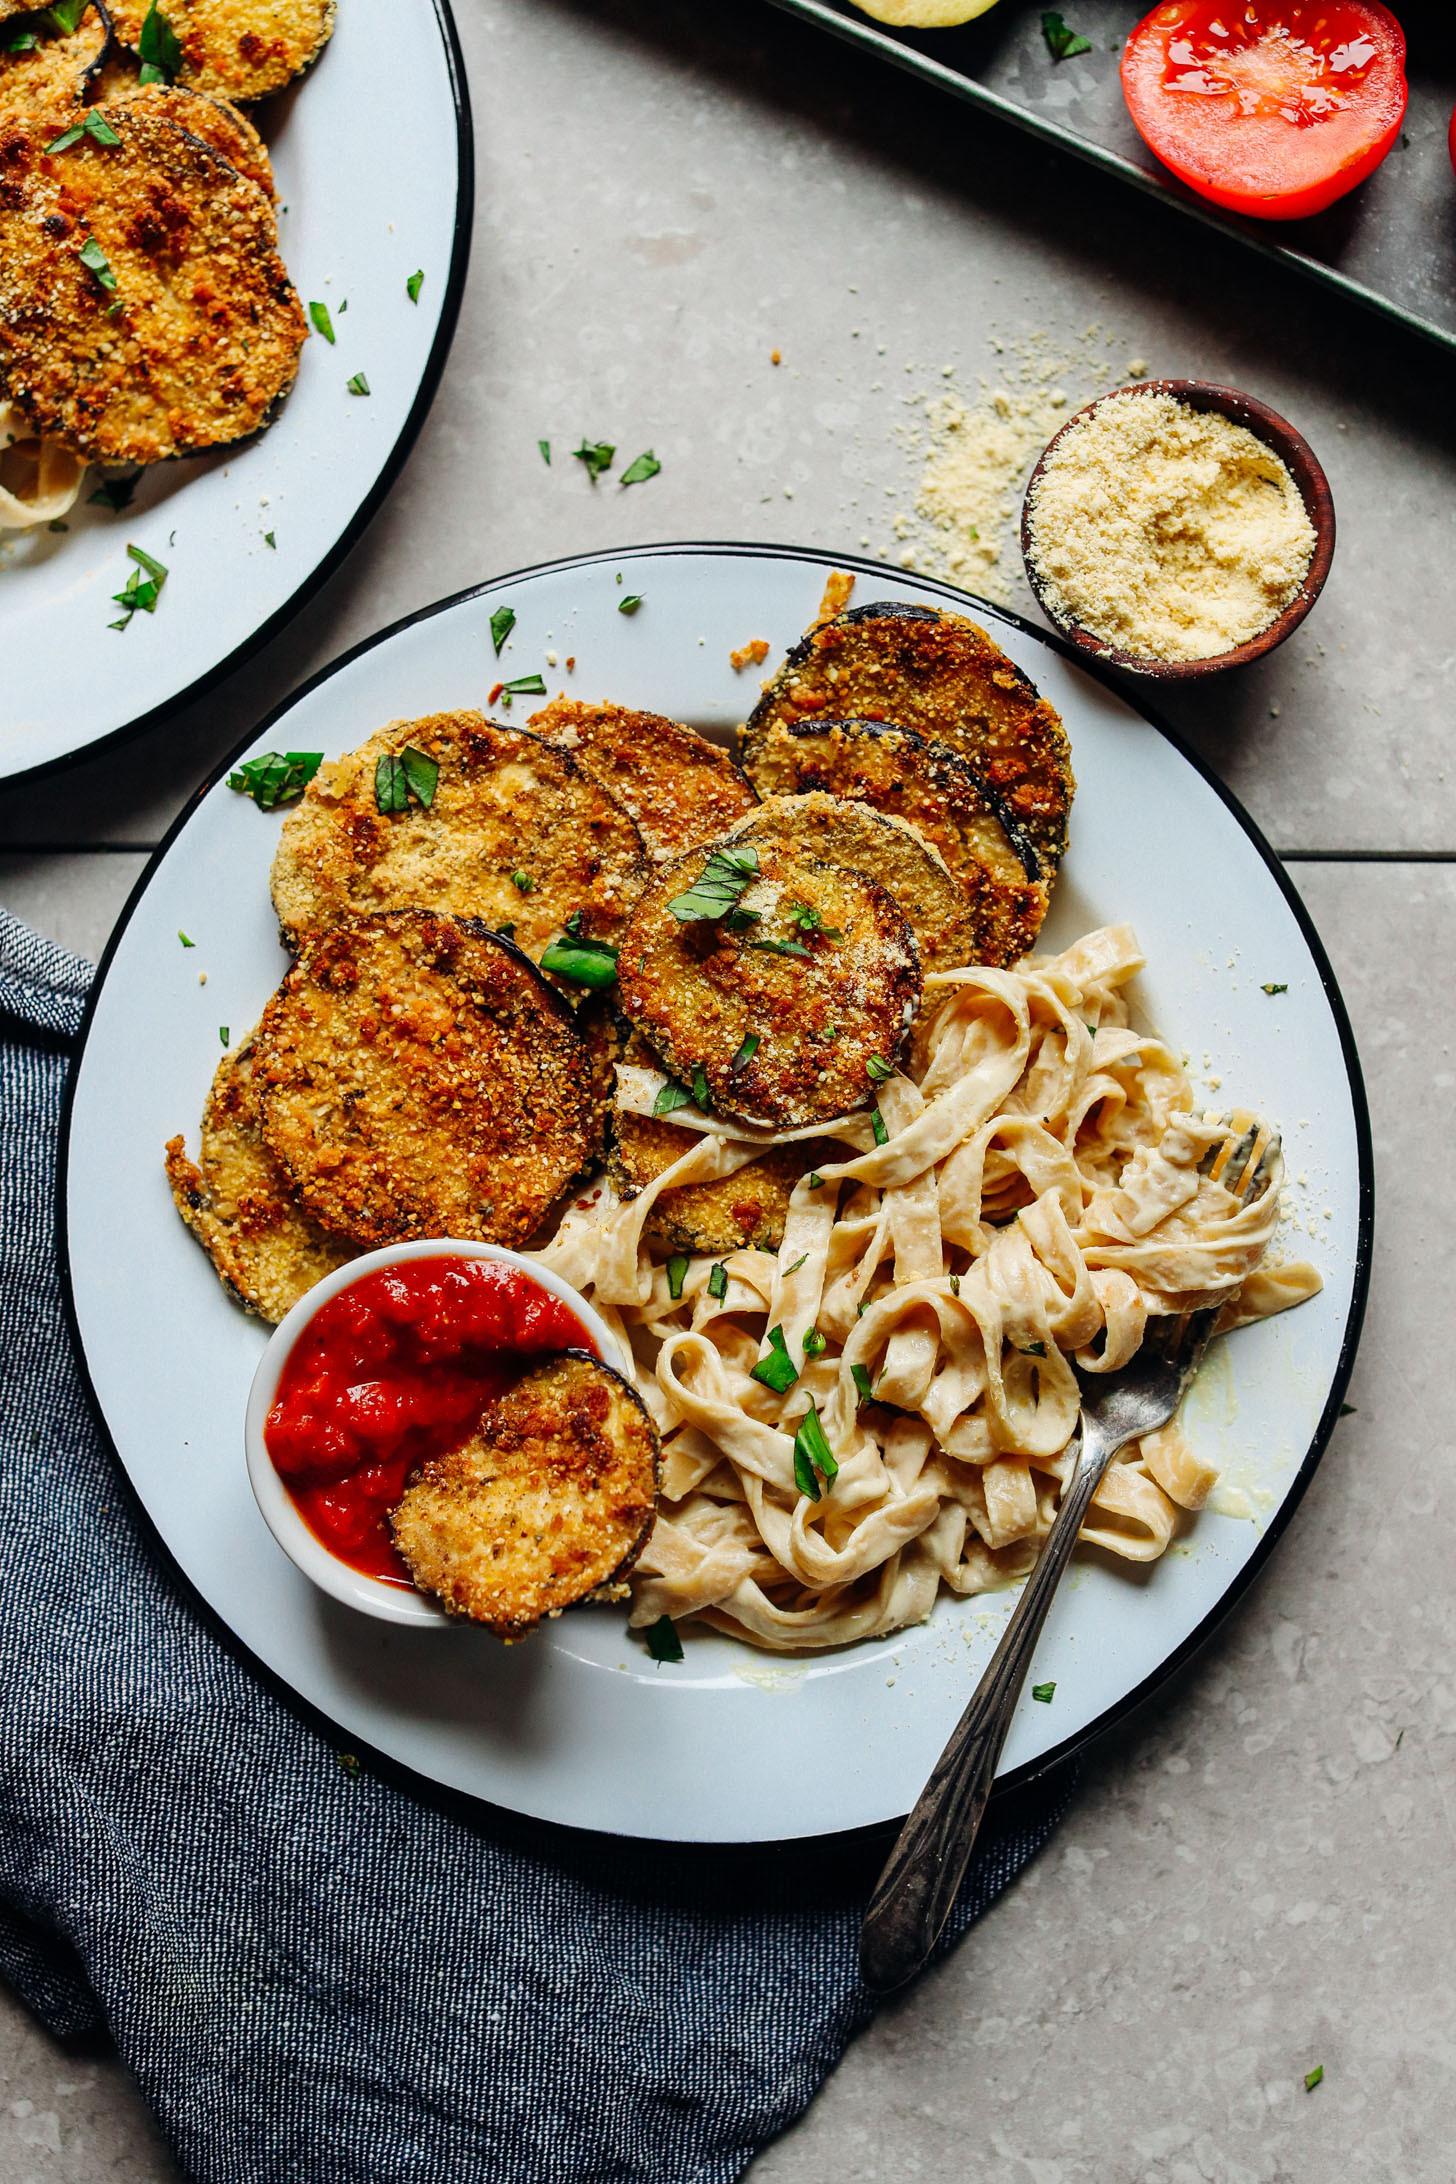 Healthy Tasty Vegetarian Recipes  Vegan Gluten Free Eggplant Parmesan